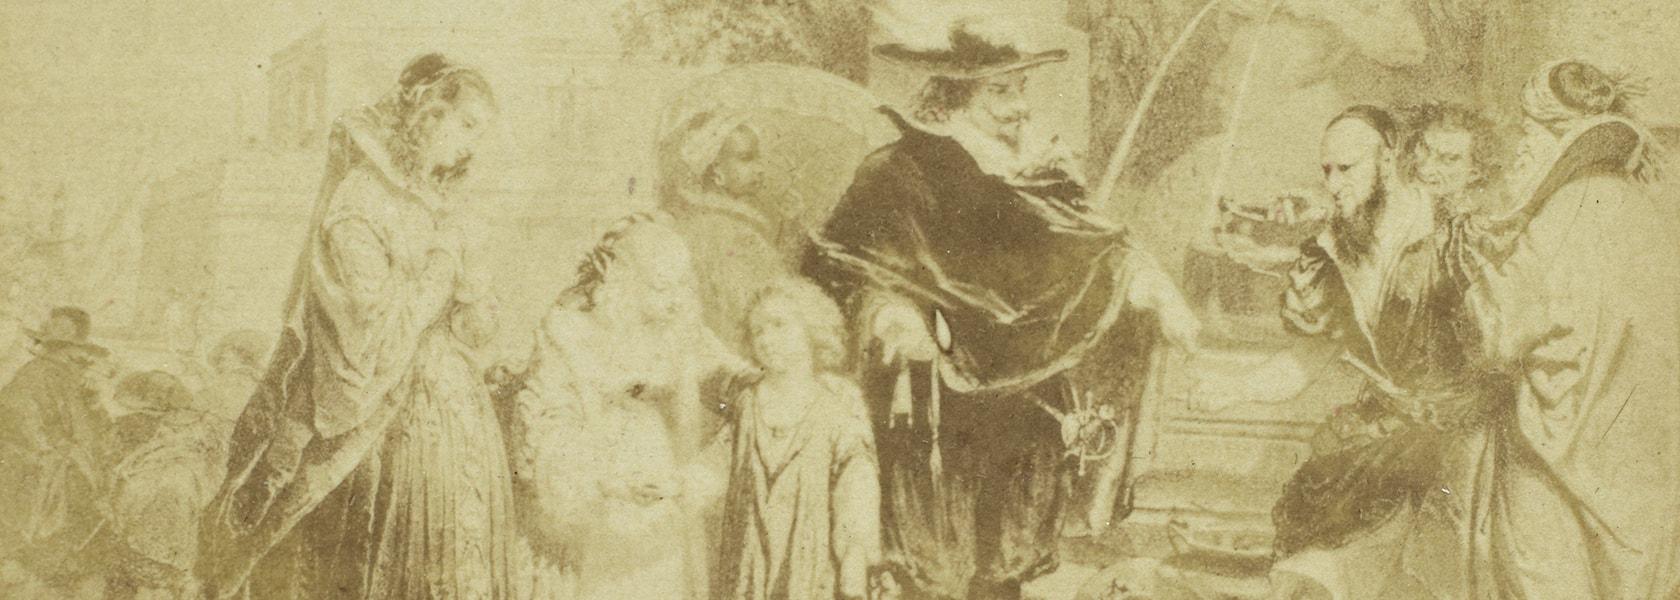 Litho van Henri Baron, Eduard Isaac Asser, ca. 1855